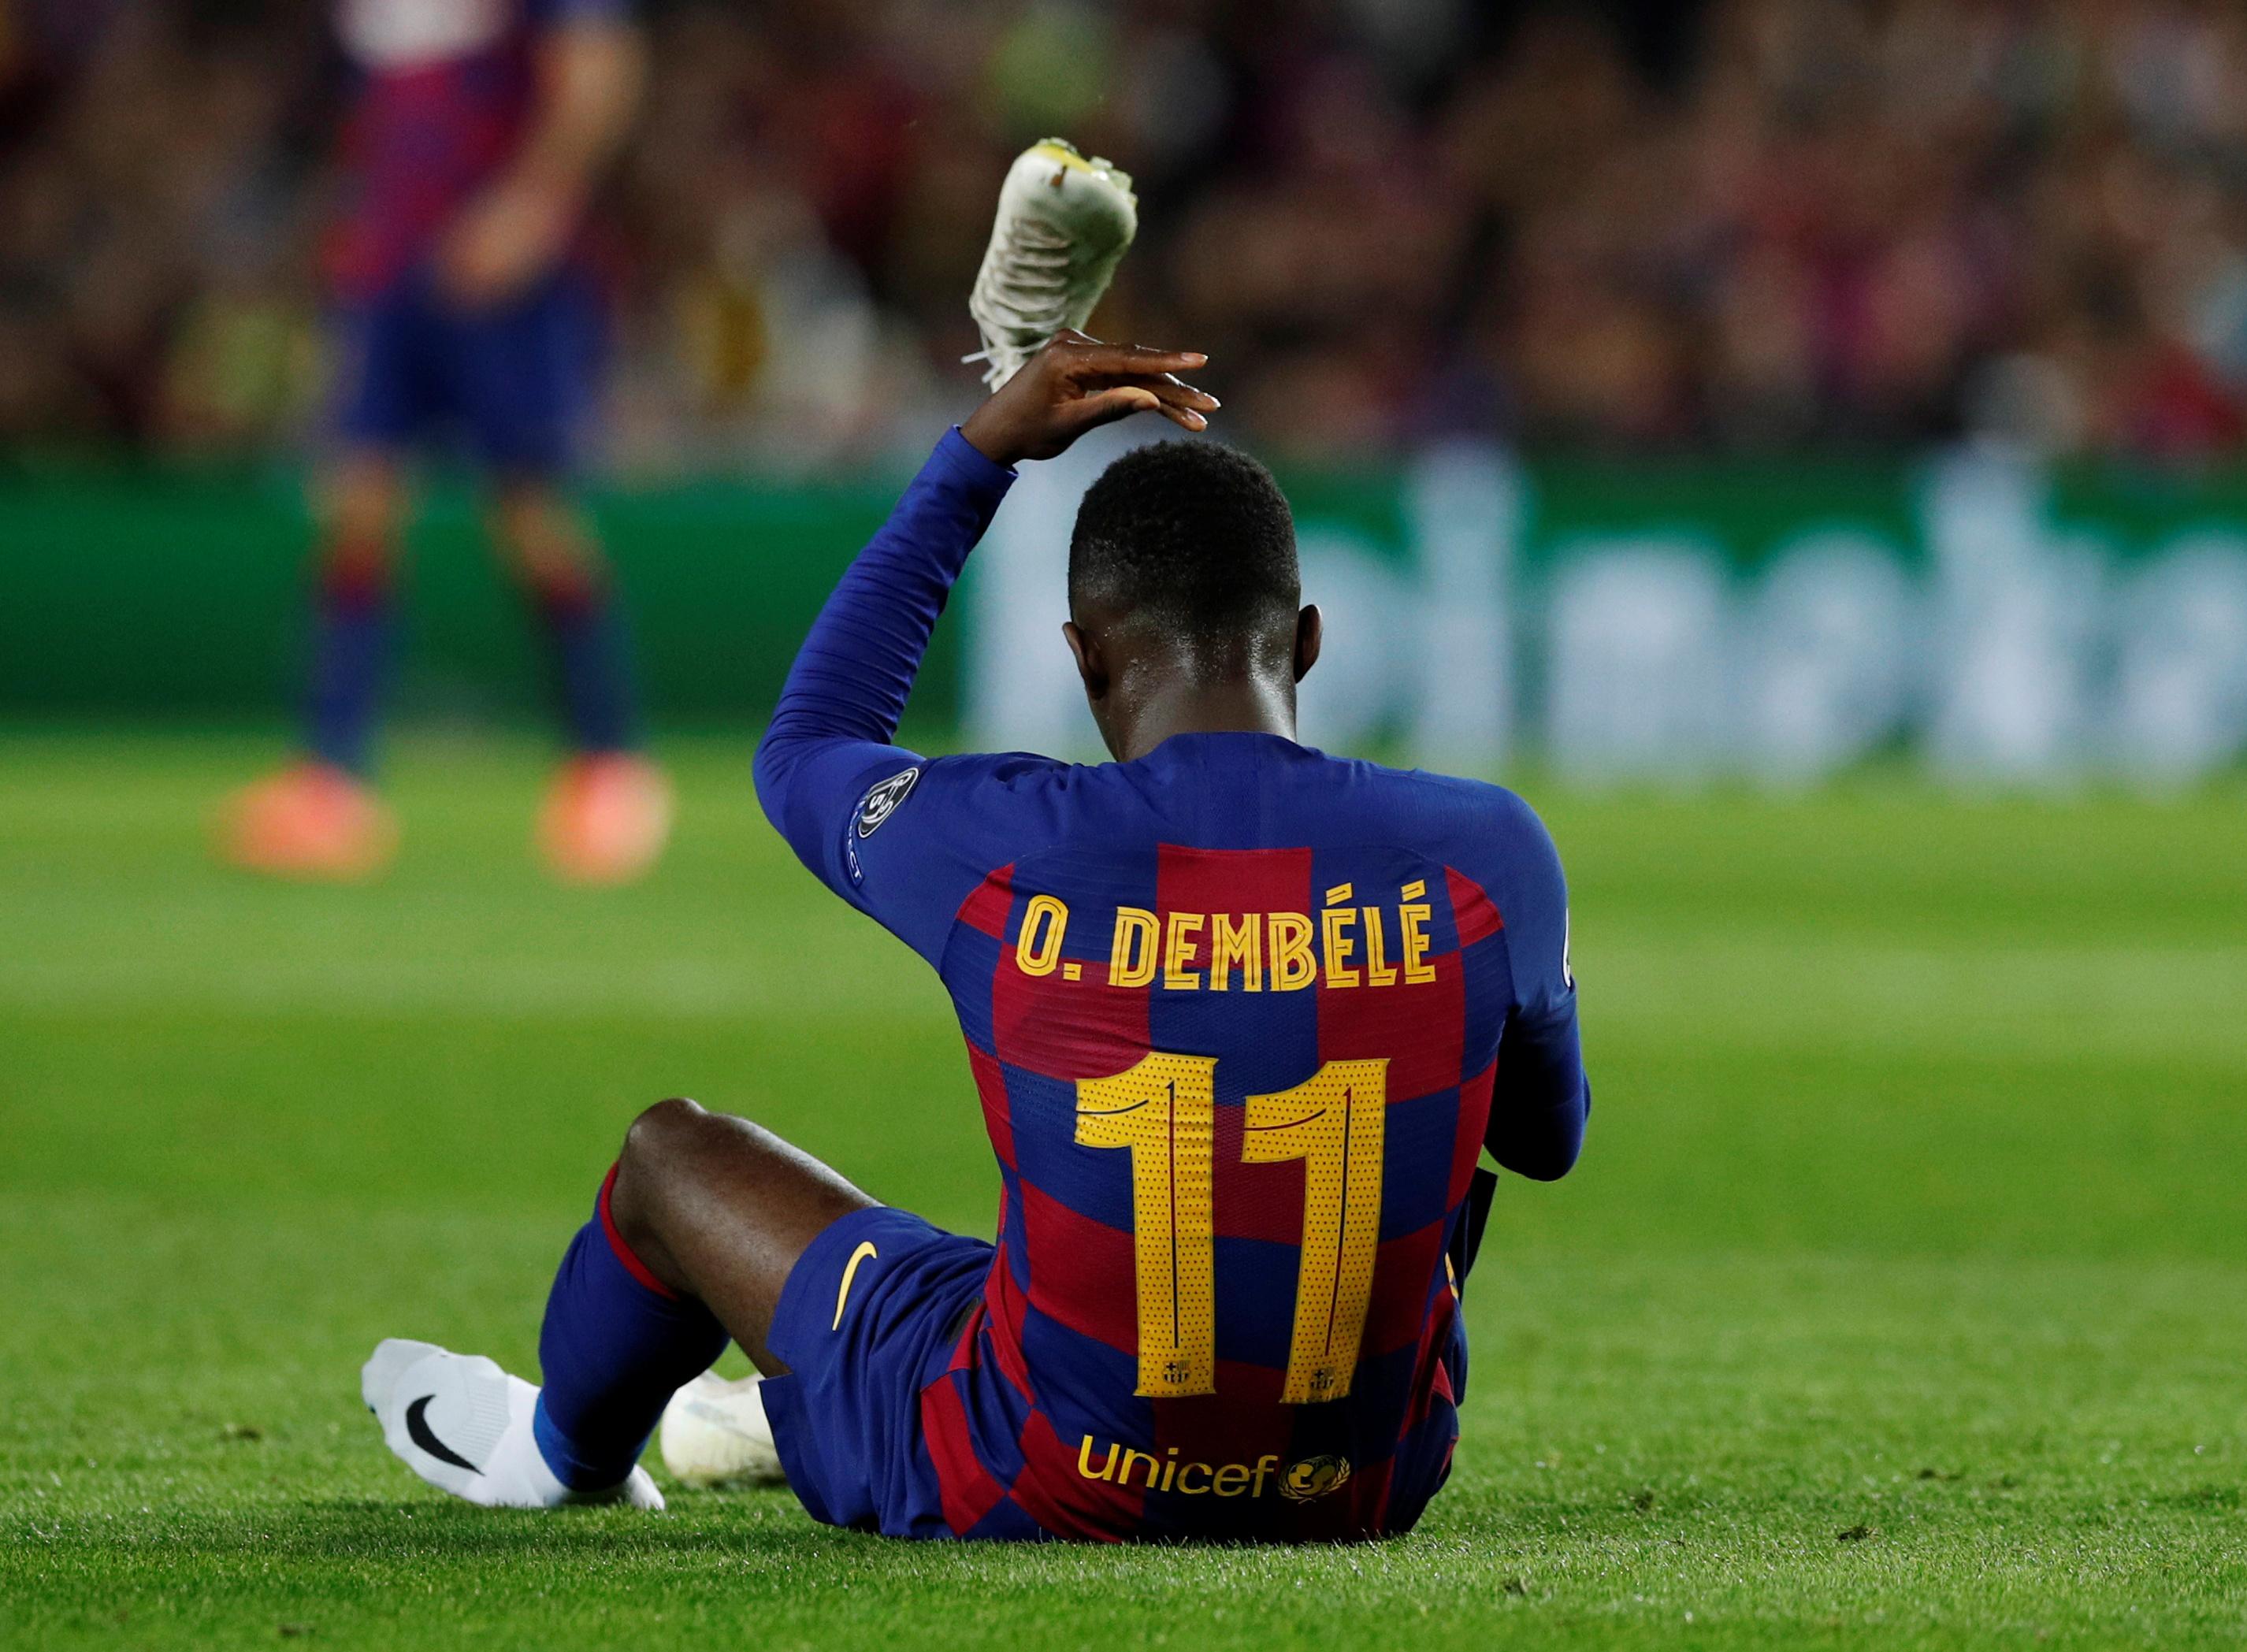 Football - Transferts - Le journal du mercato : Ousmane Dembélé, indésirable au Barça ?